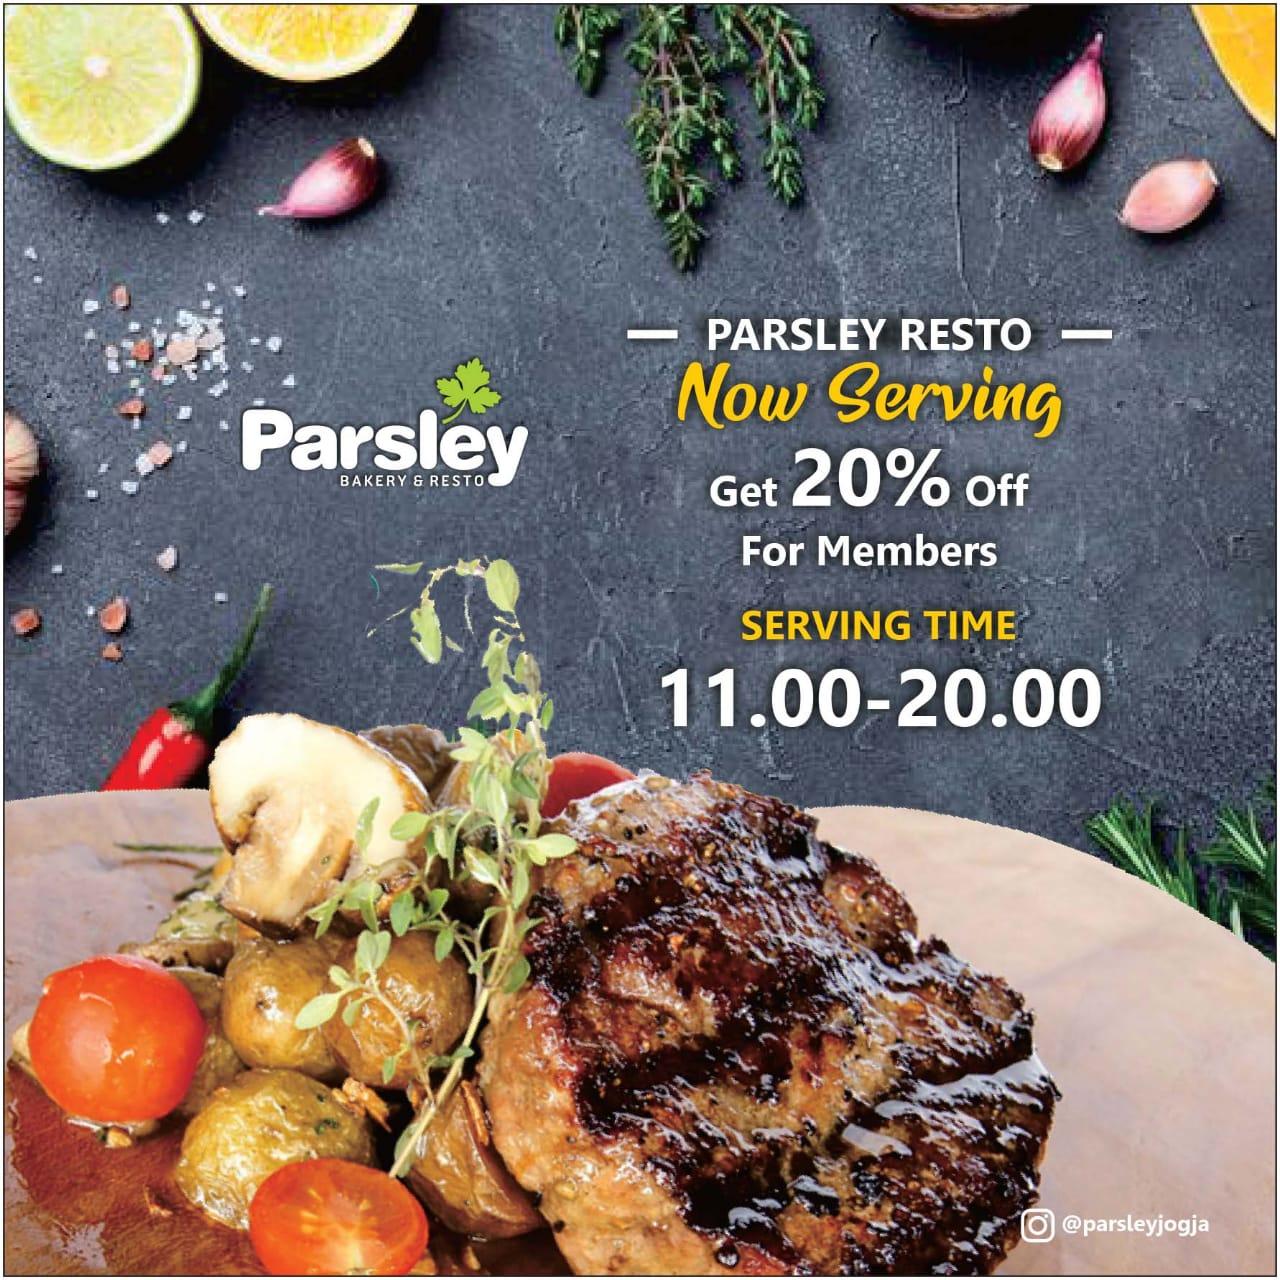 Get 20% off for Members at Parsley Resto Jakal & Seturan